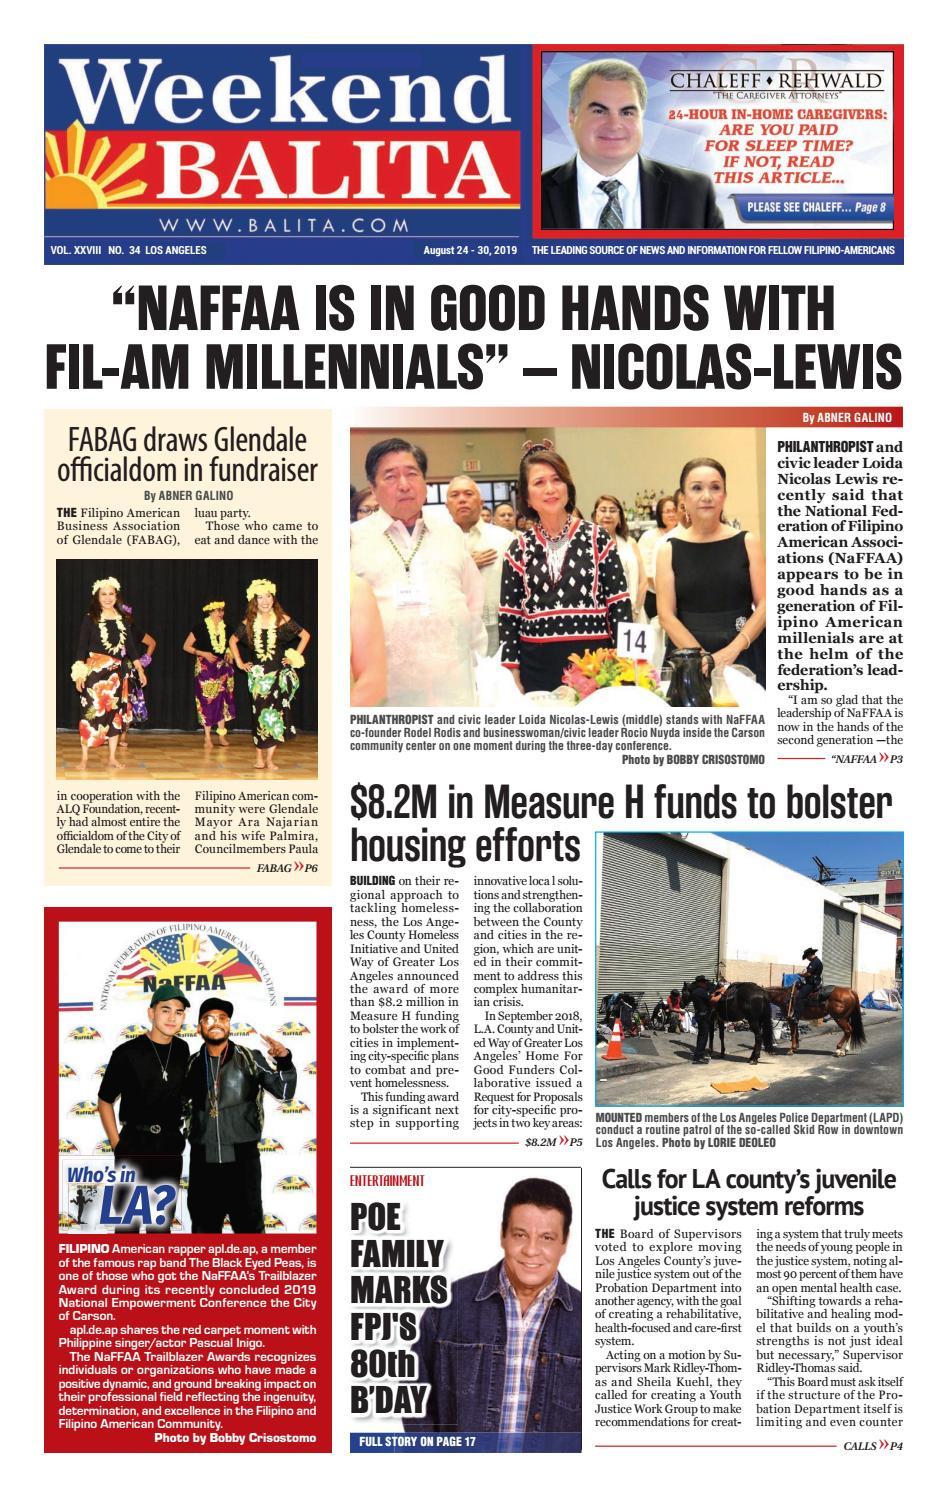 Weekend Balita August 24 2019 By Balita Media Inc Issuu